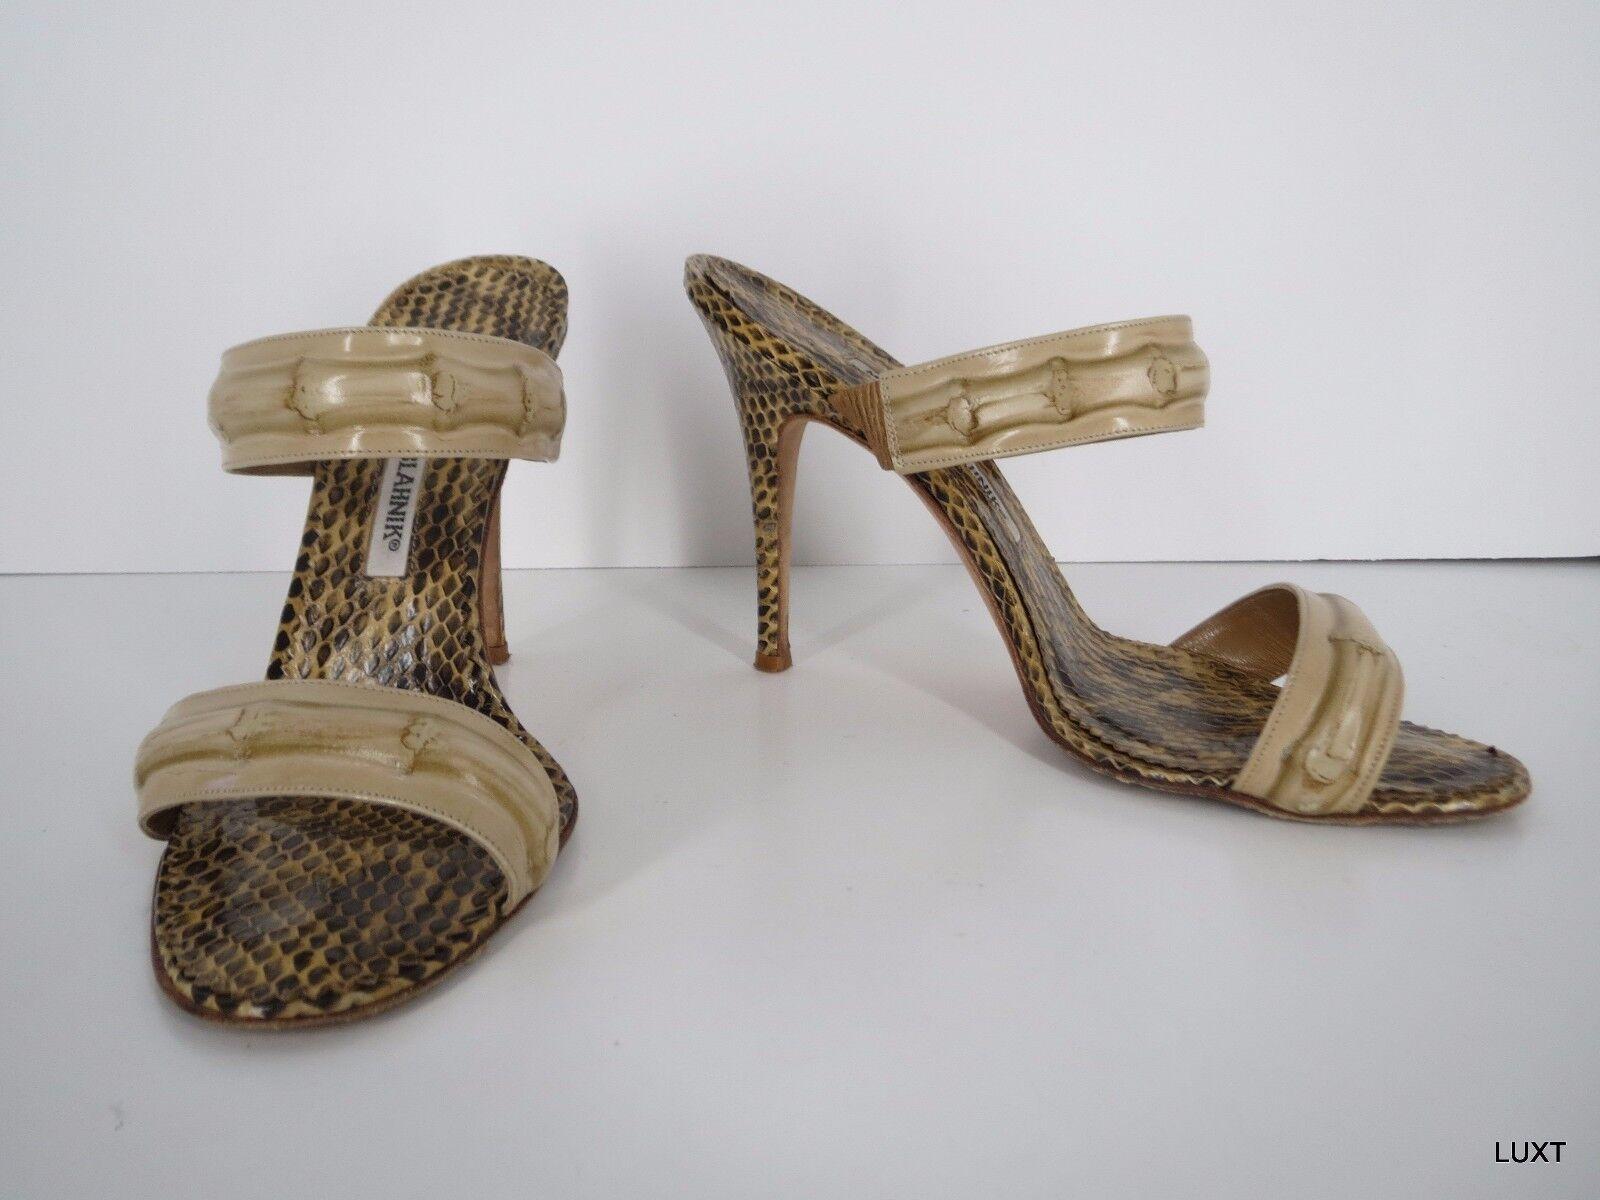 Manolo Blahnik Sandals Sandals Sandals Heels Slides Größe 8 38 Tan Bamboo Snakeskin Open Toe ec5e86